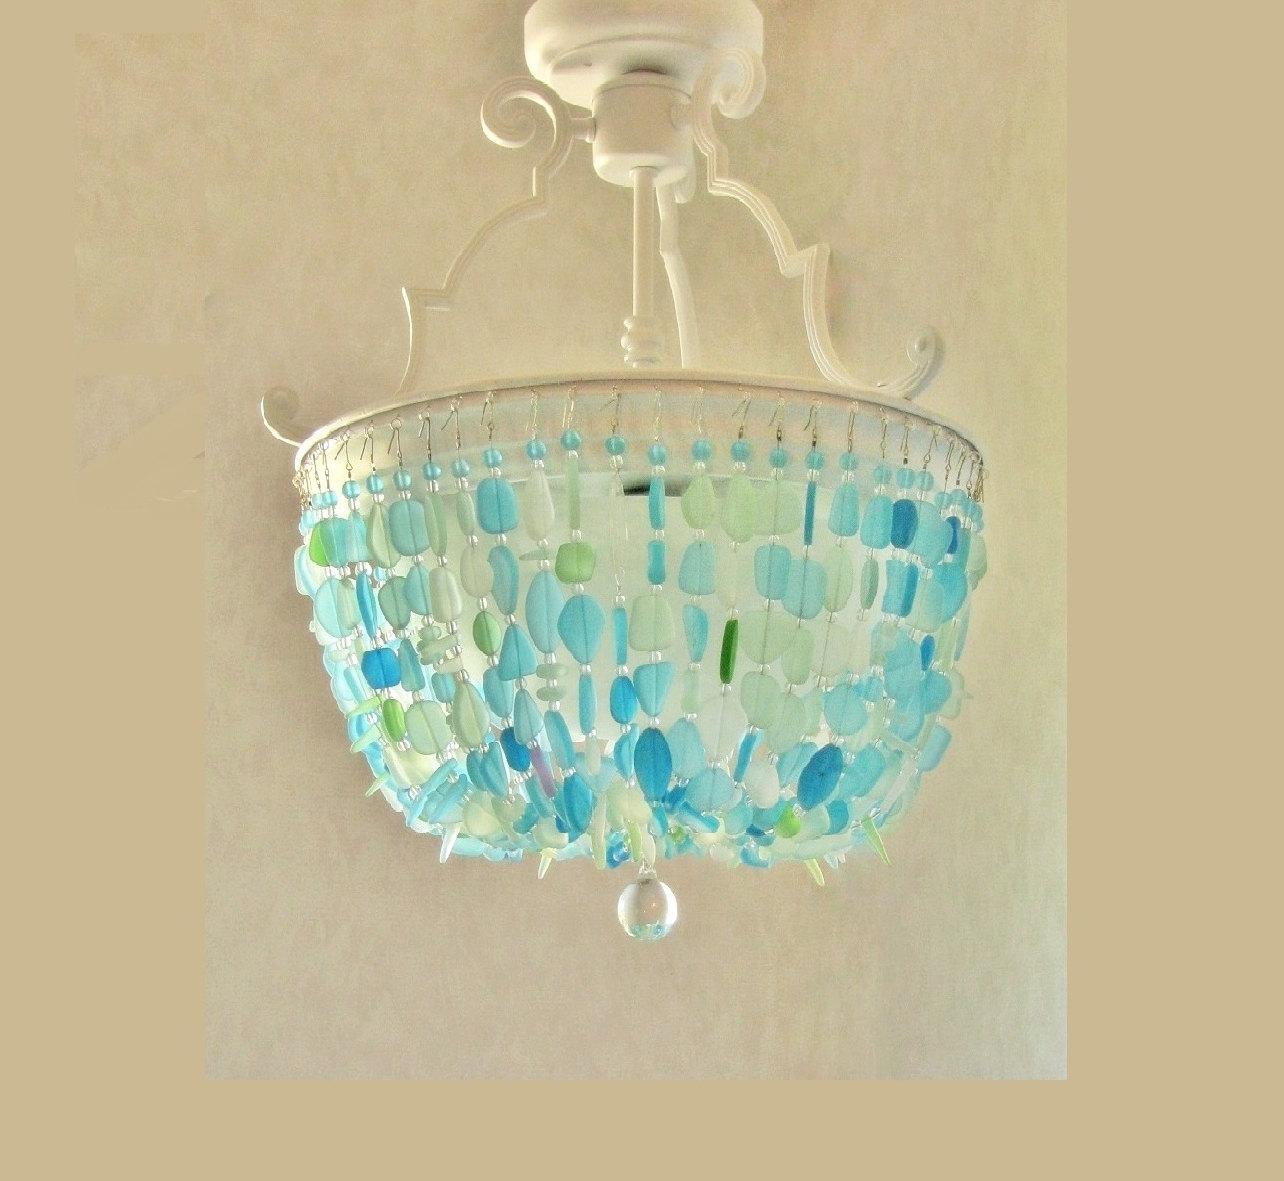 New Sea Glass Chandelier Lighting Fixture Beach Glass Ceiling RL75